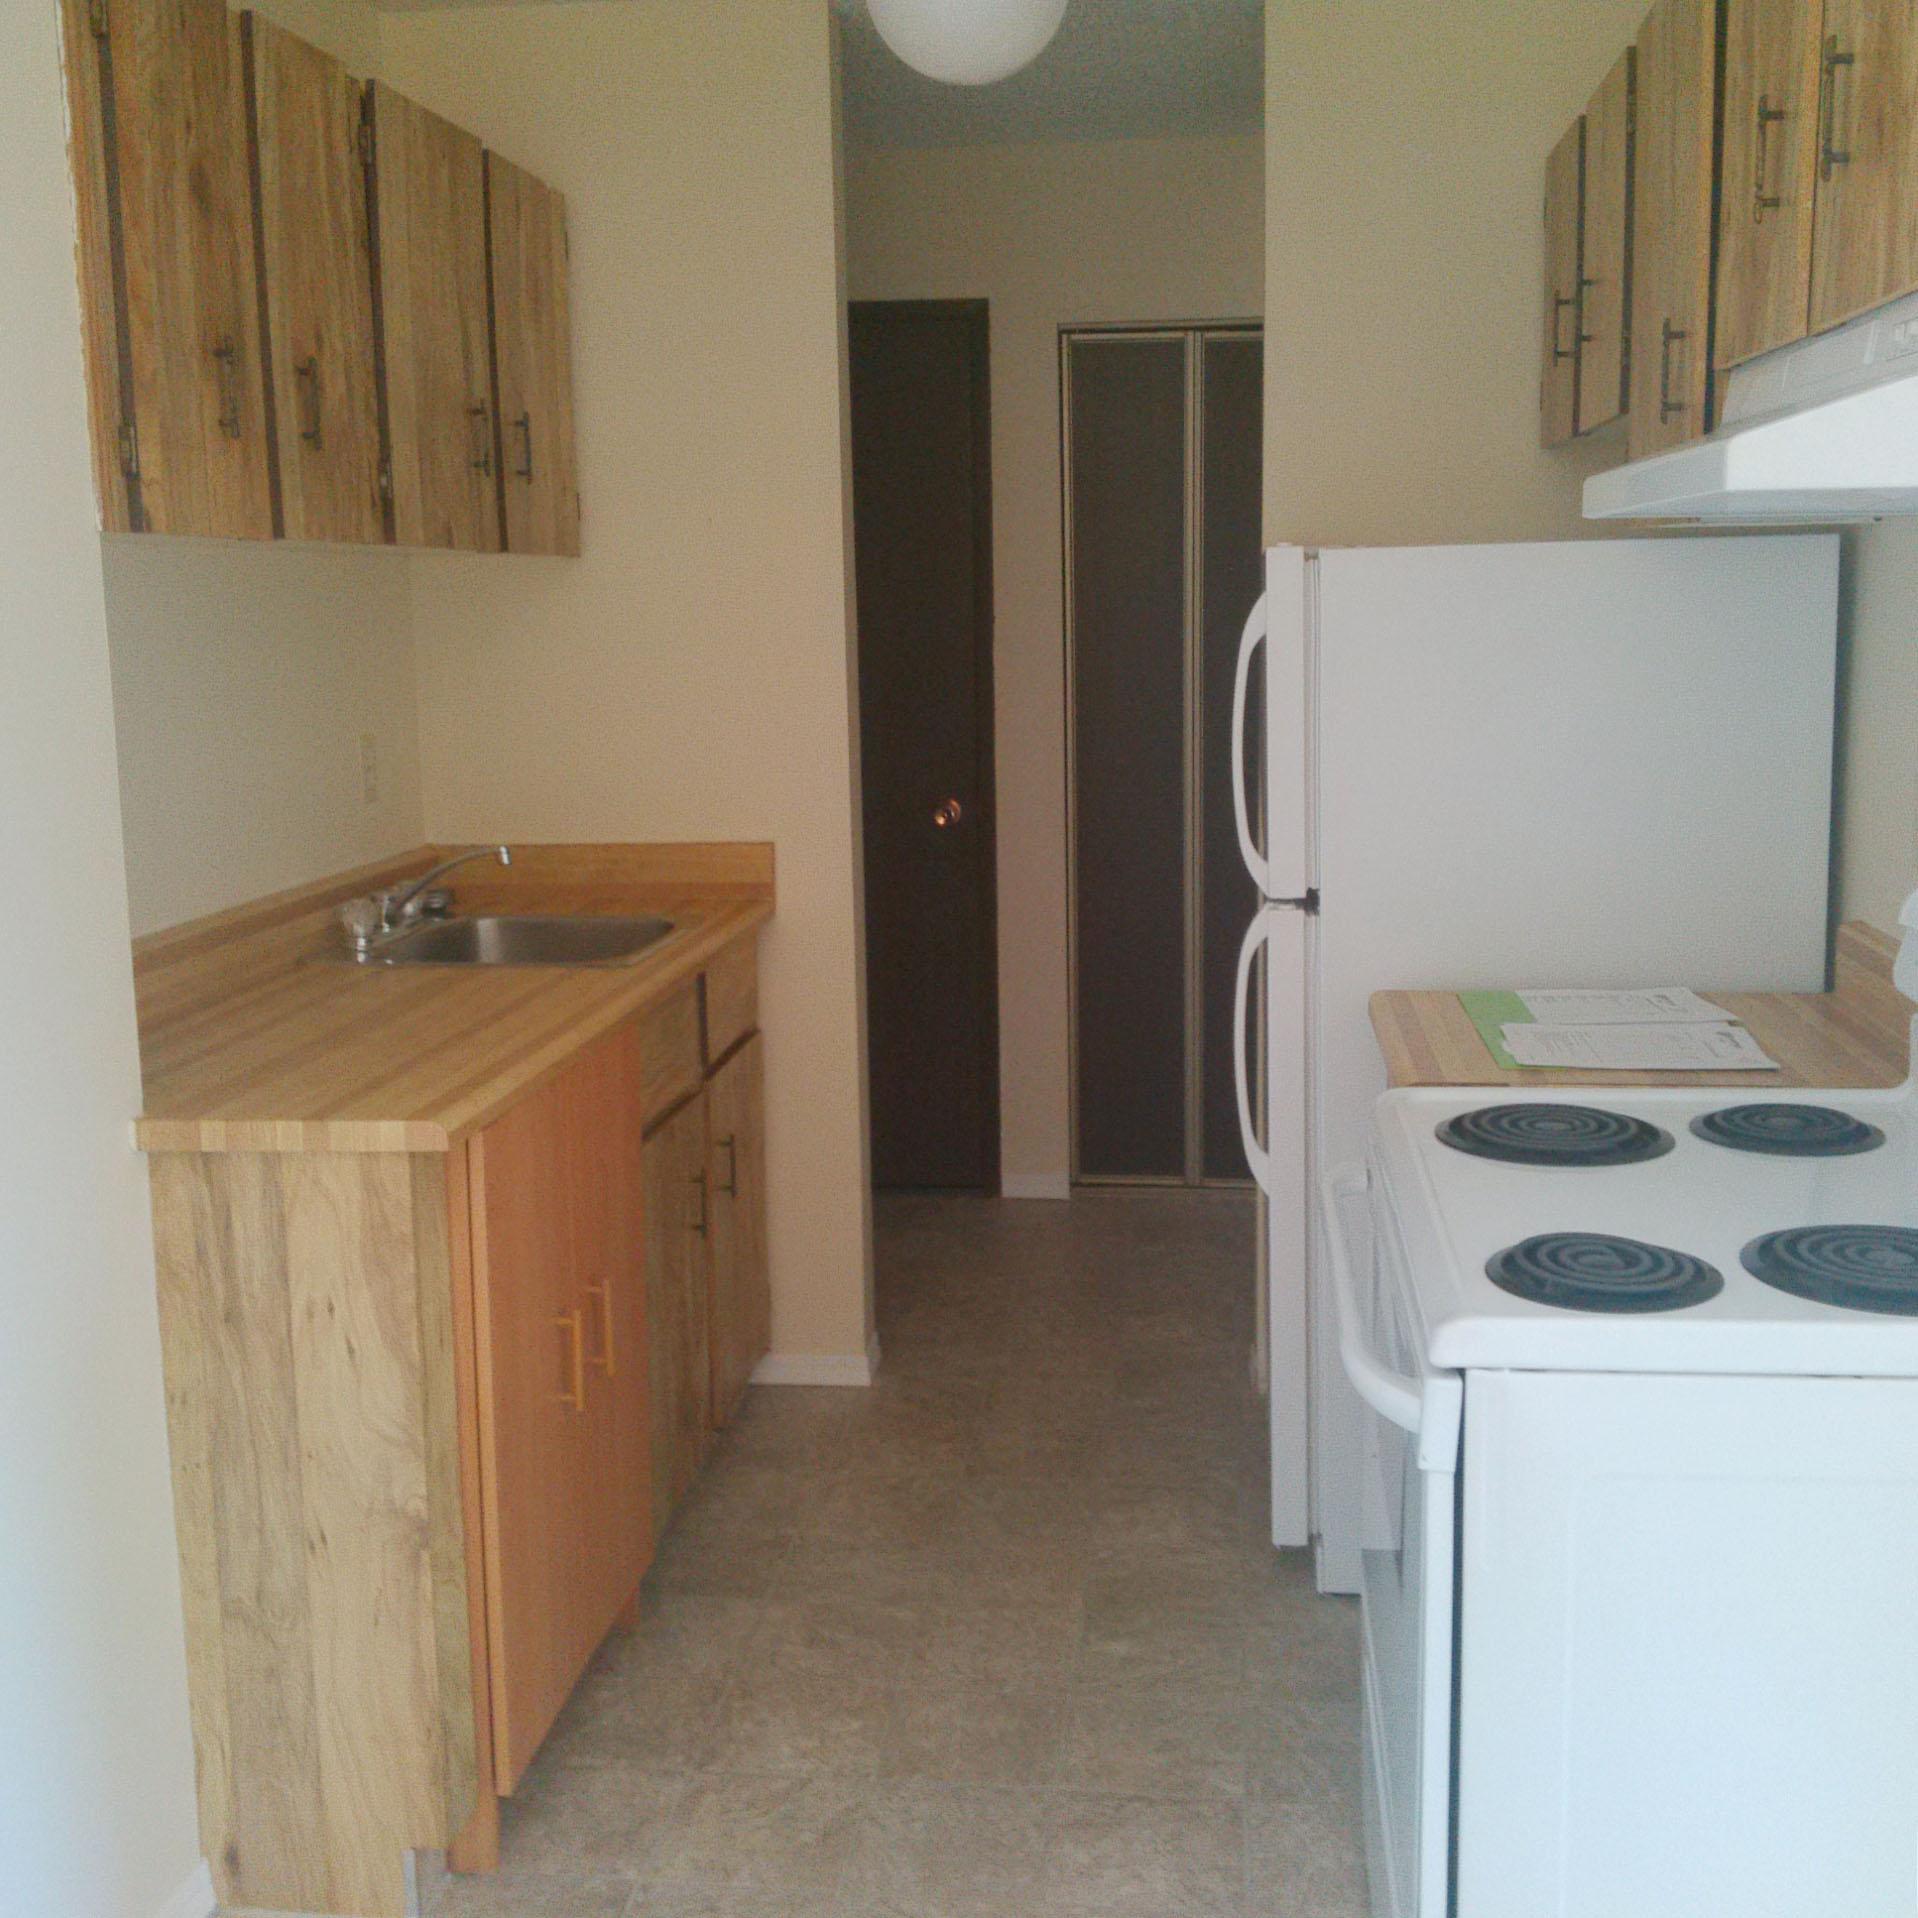 Apartment Rental: Westwind Apartments Wetaskiwin Apartment Rent